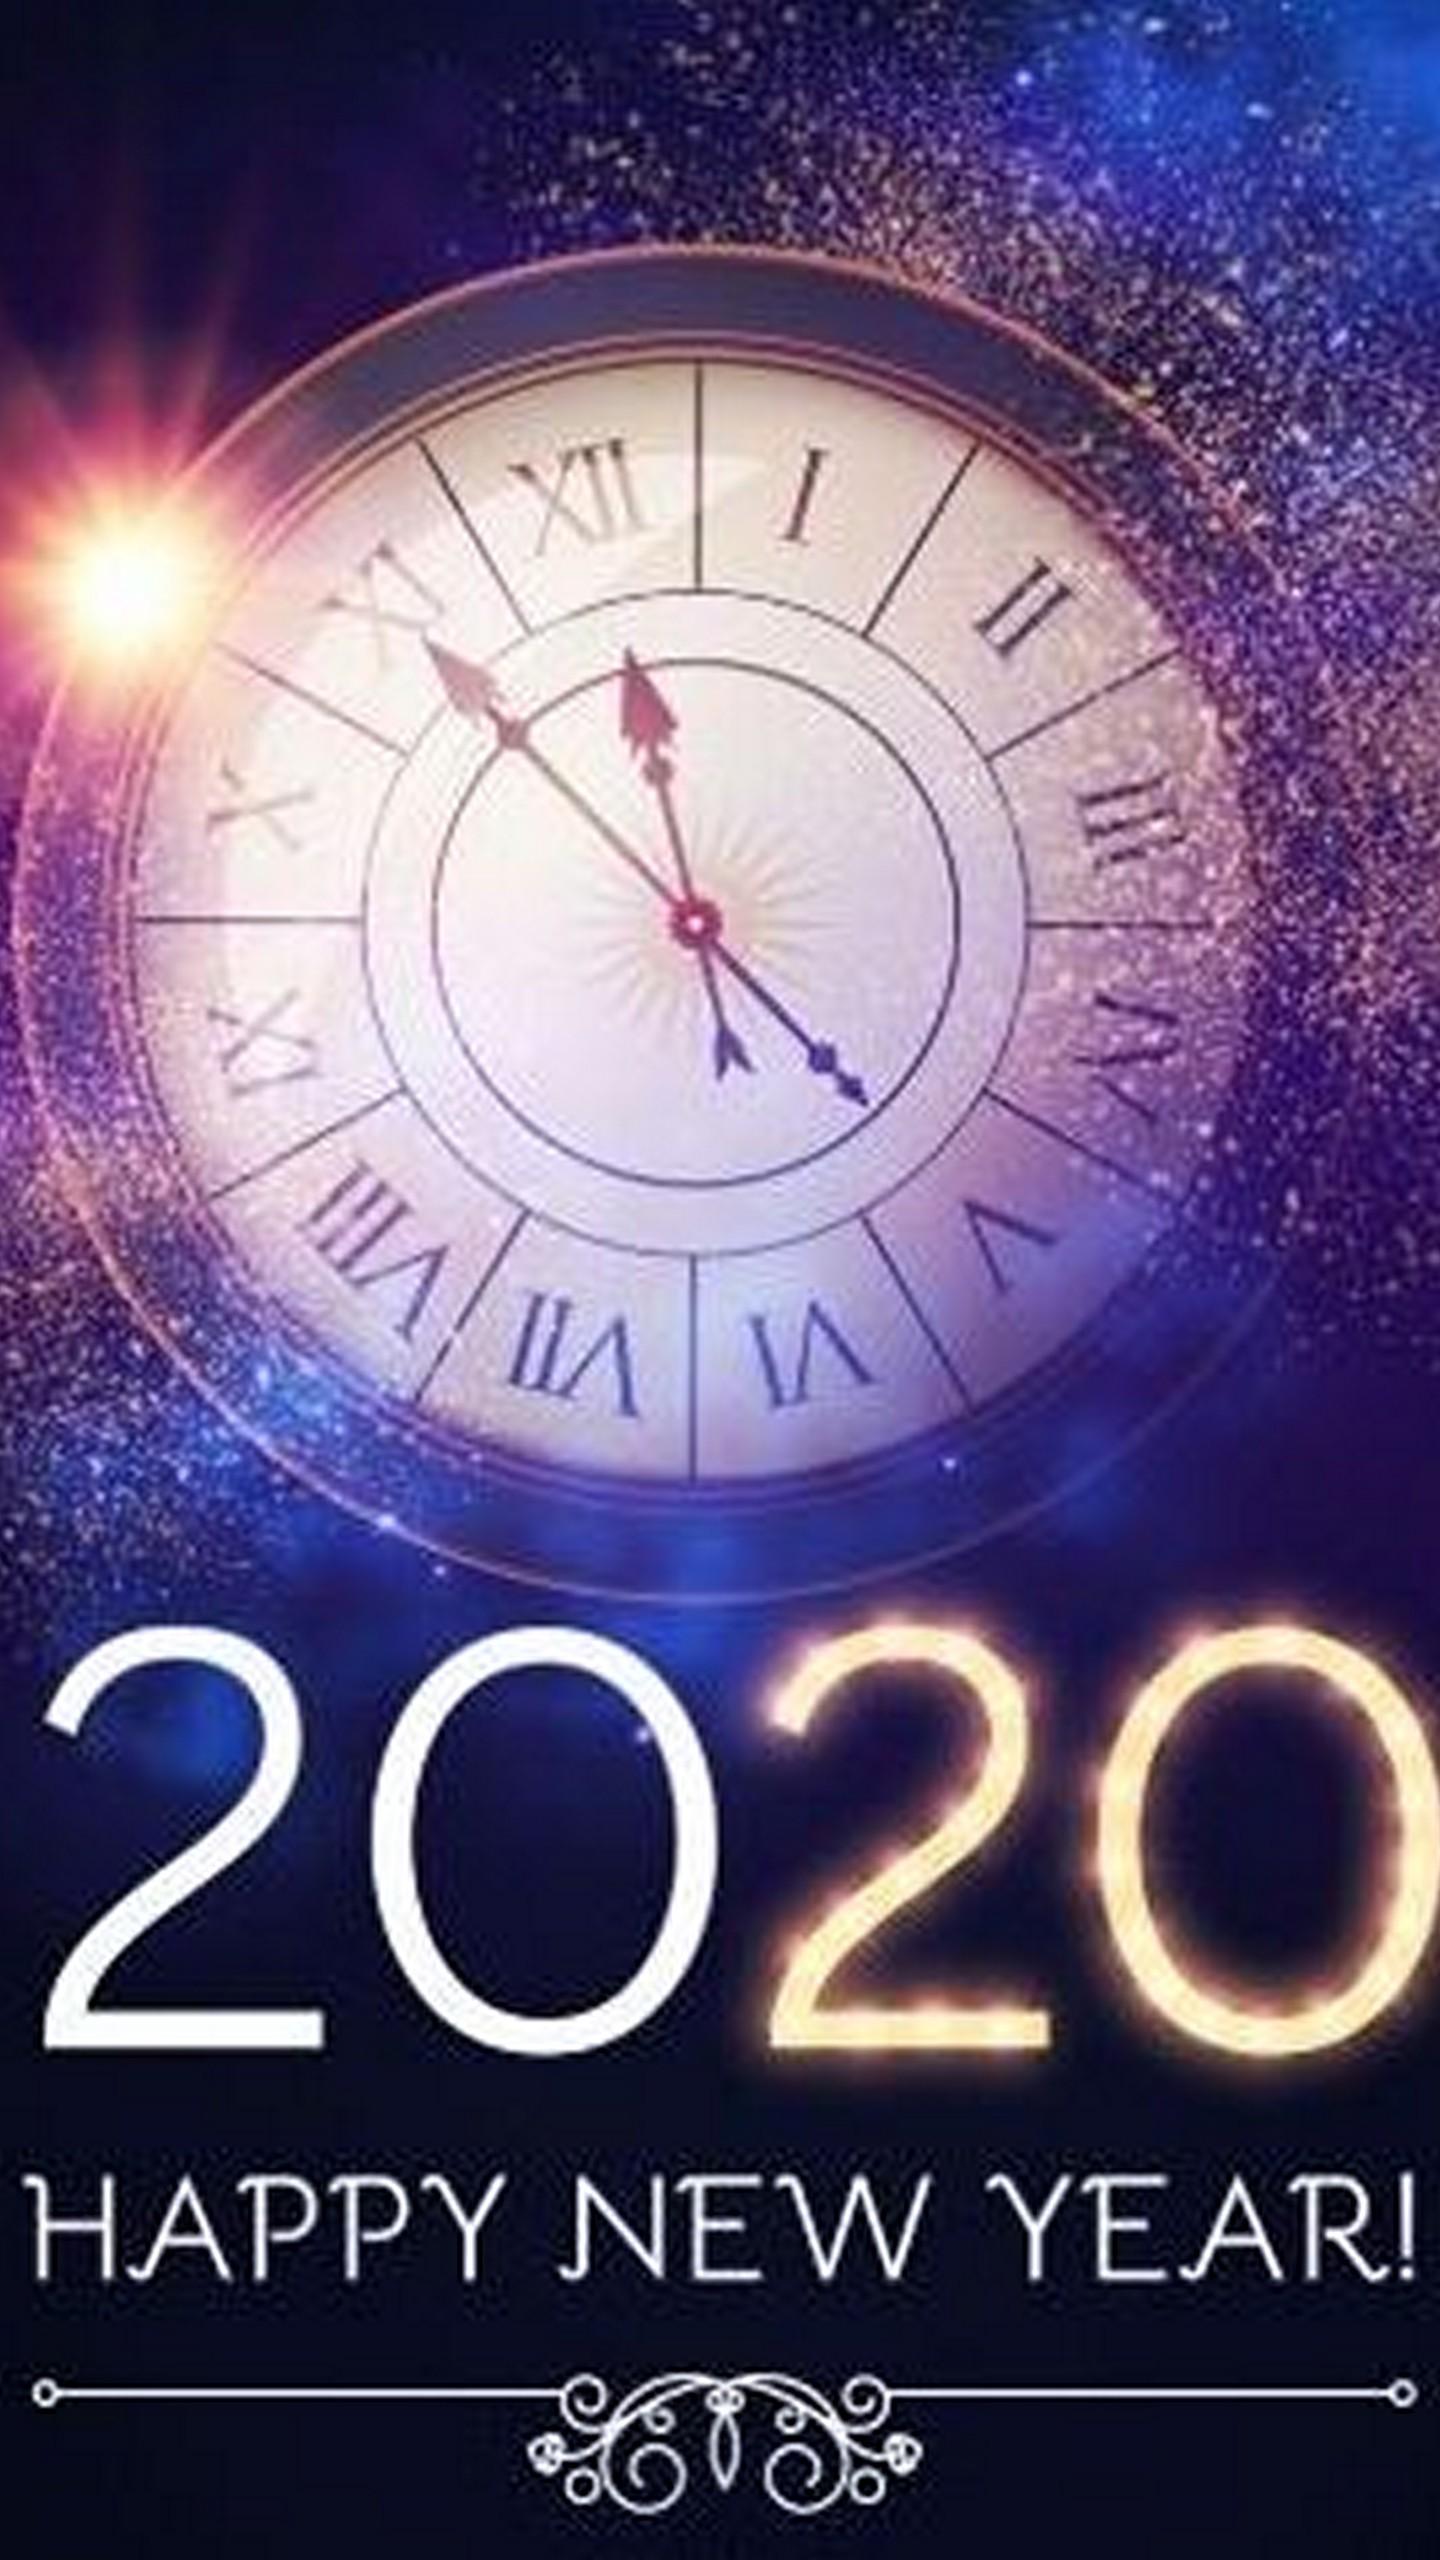 Happy New Year 2020 Wallpaper 01 1440x2560